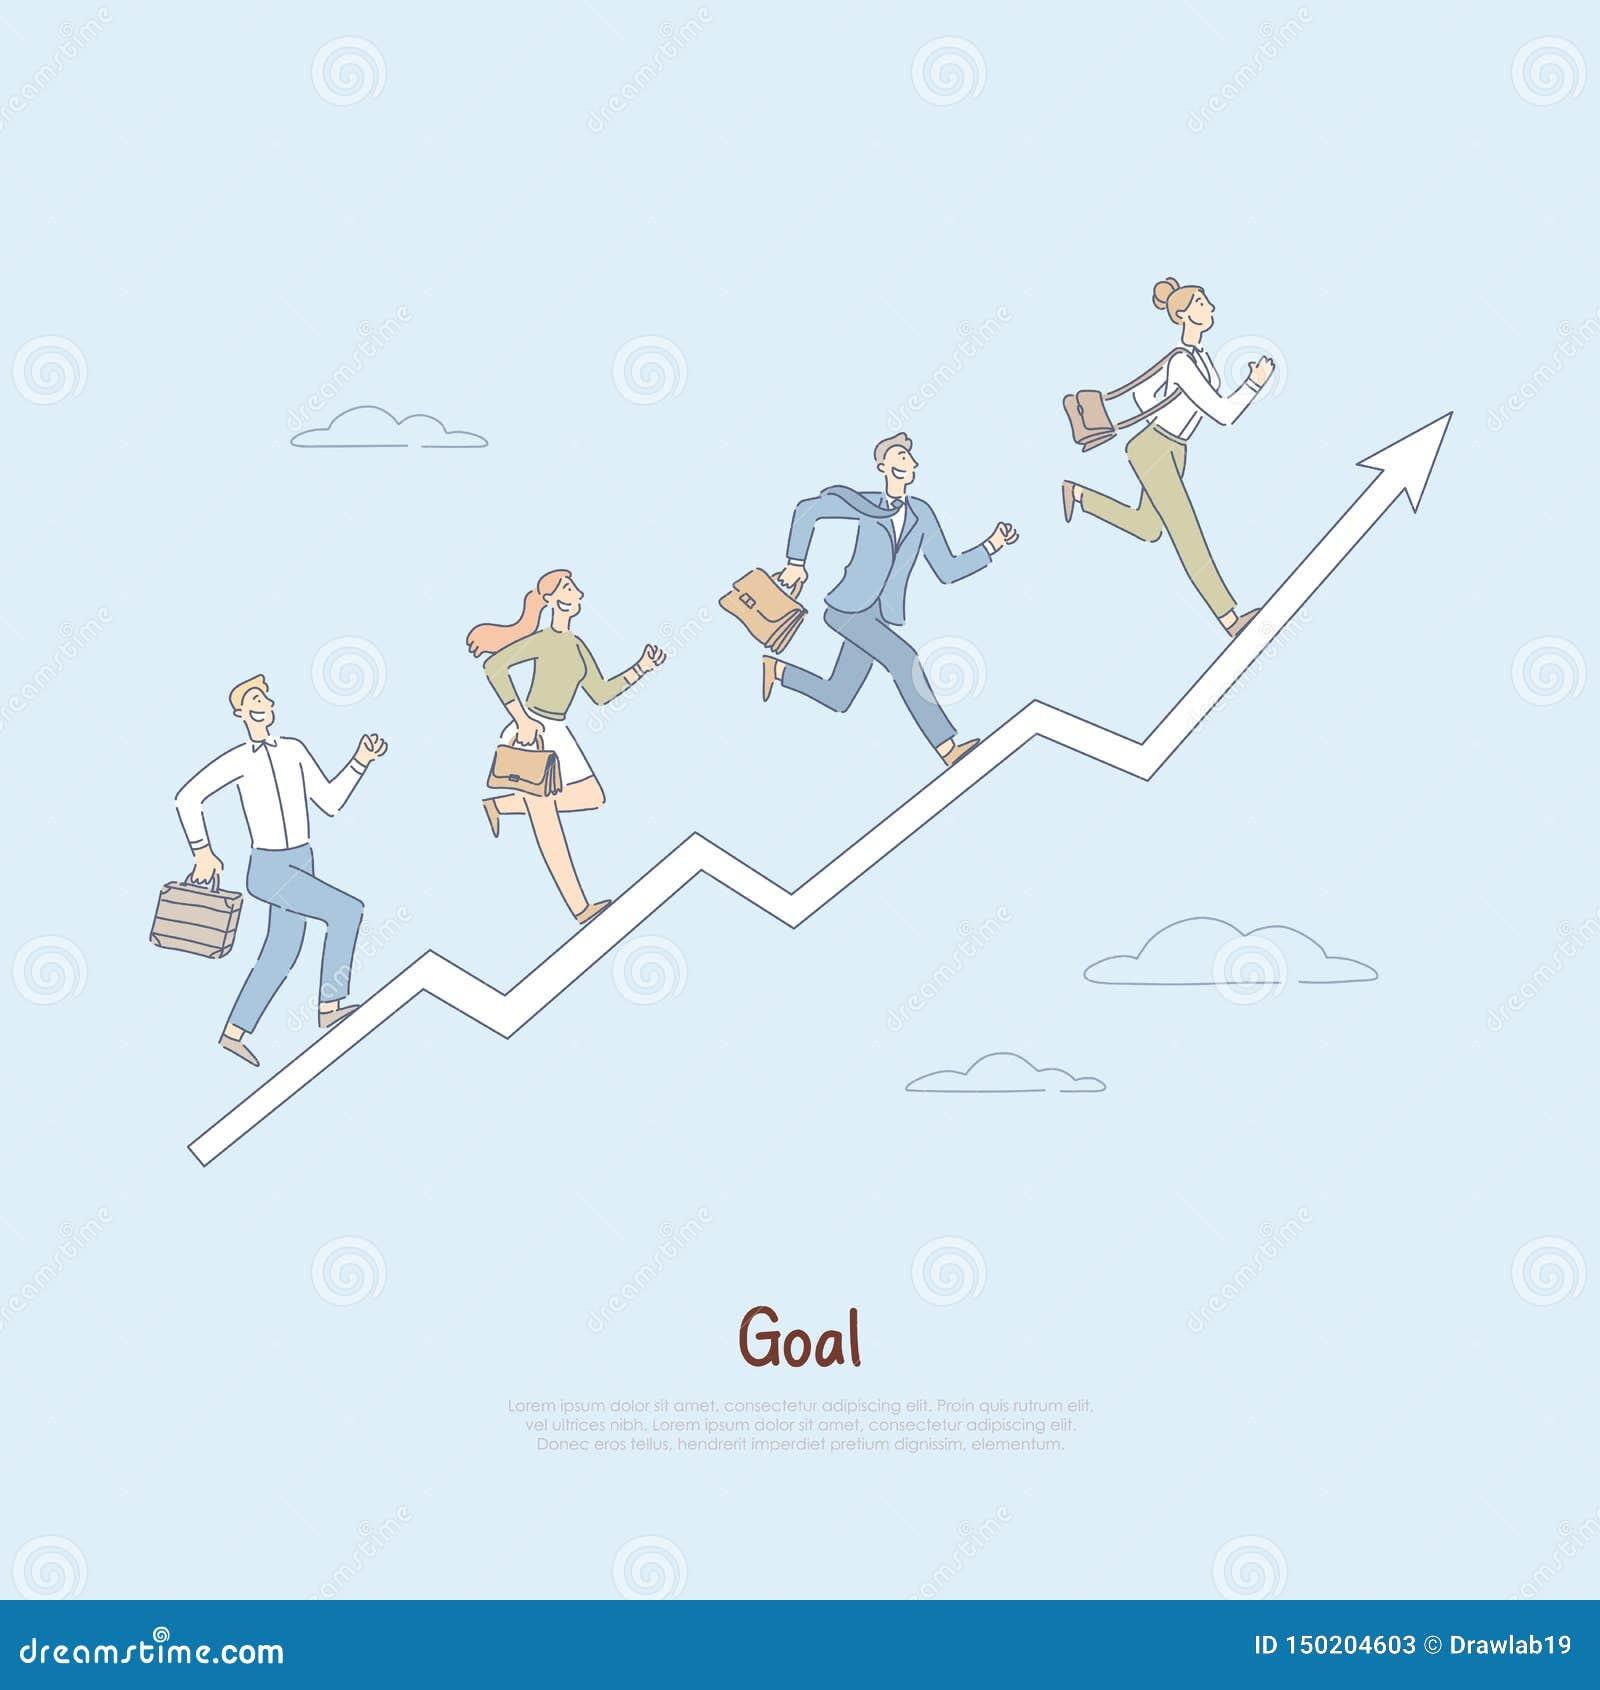 People Running Up Progress Arrow Journey Towards Achieving Success Teamwork In Workplace Self Improvement Metaphor Stock Vector Illustration Of Development Ladder 150204603